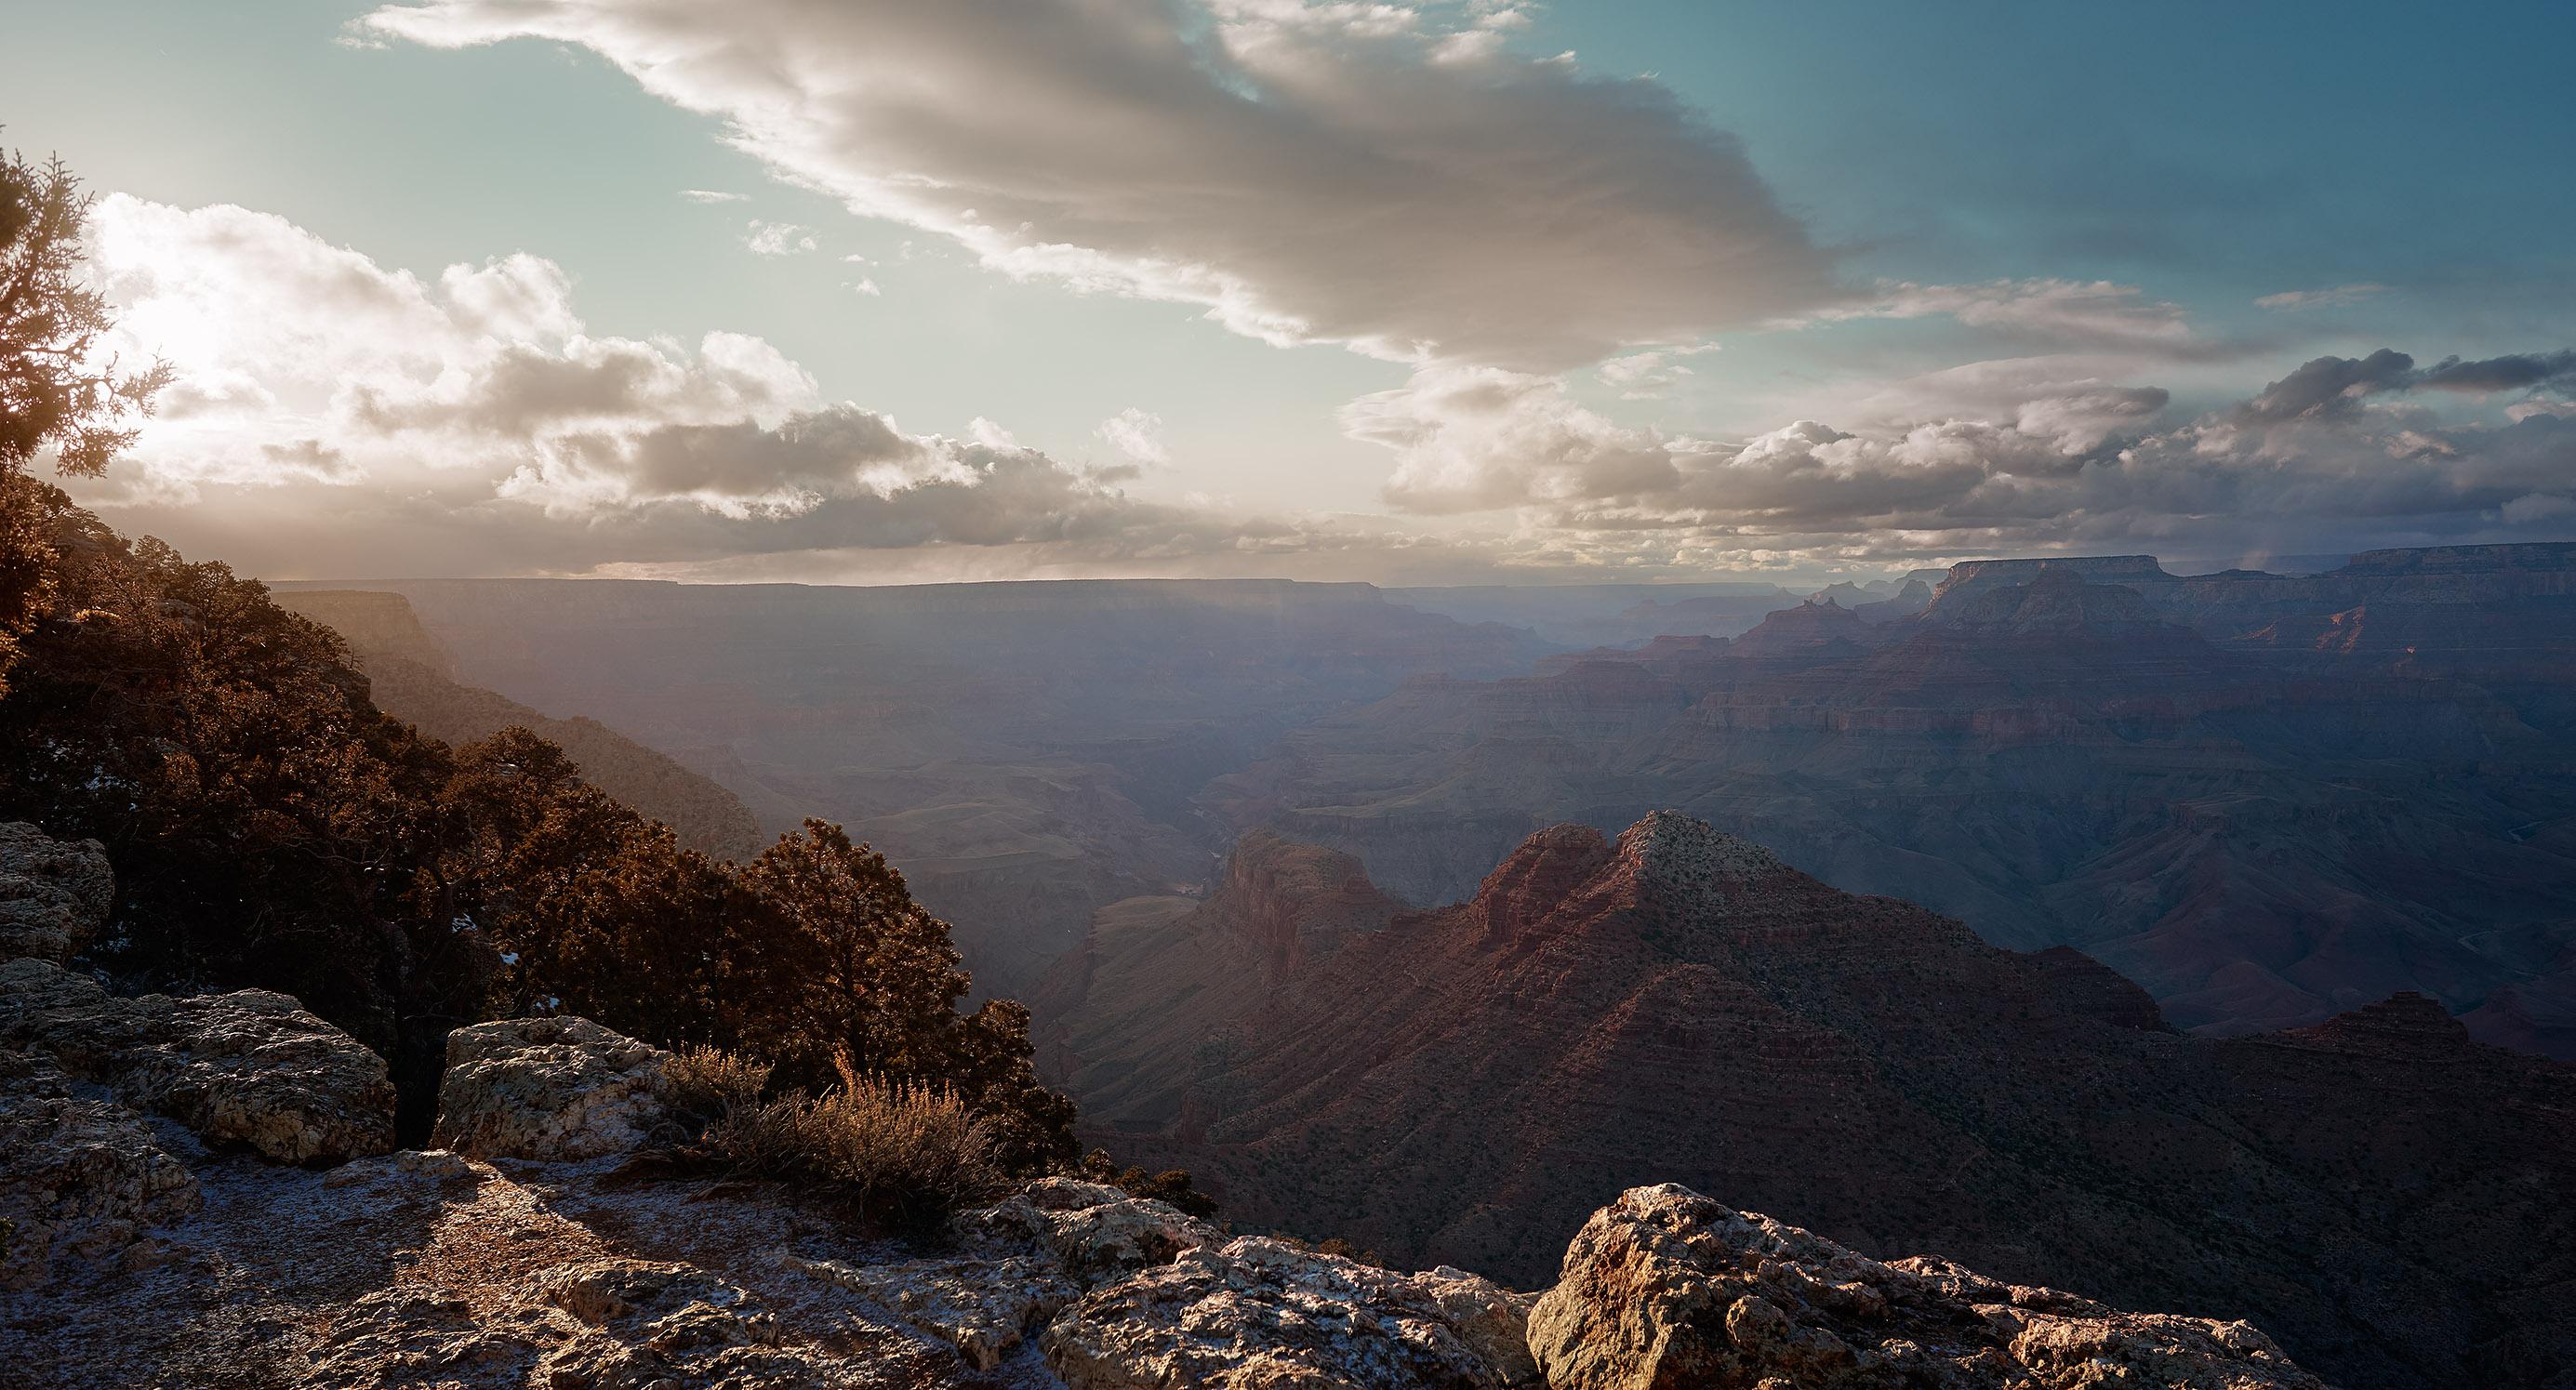 arizona commercial photographer, arizona commercial photography, arizona landscape photographer, arizona landscape photography, grand canyon, arizona